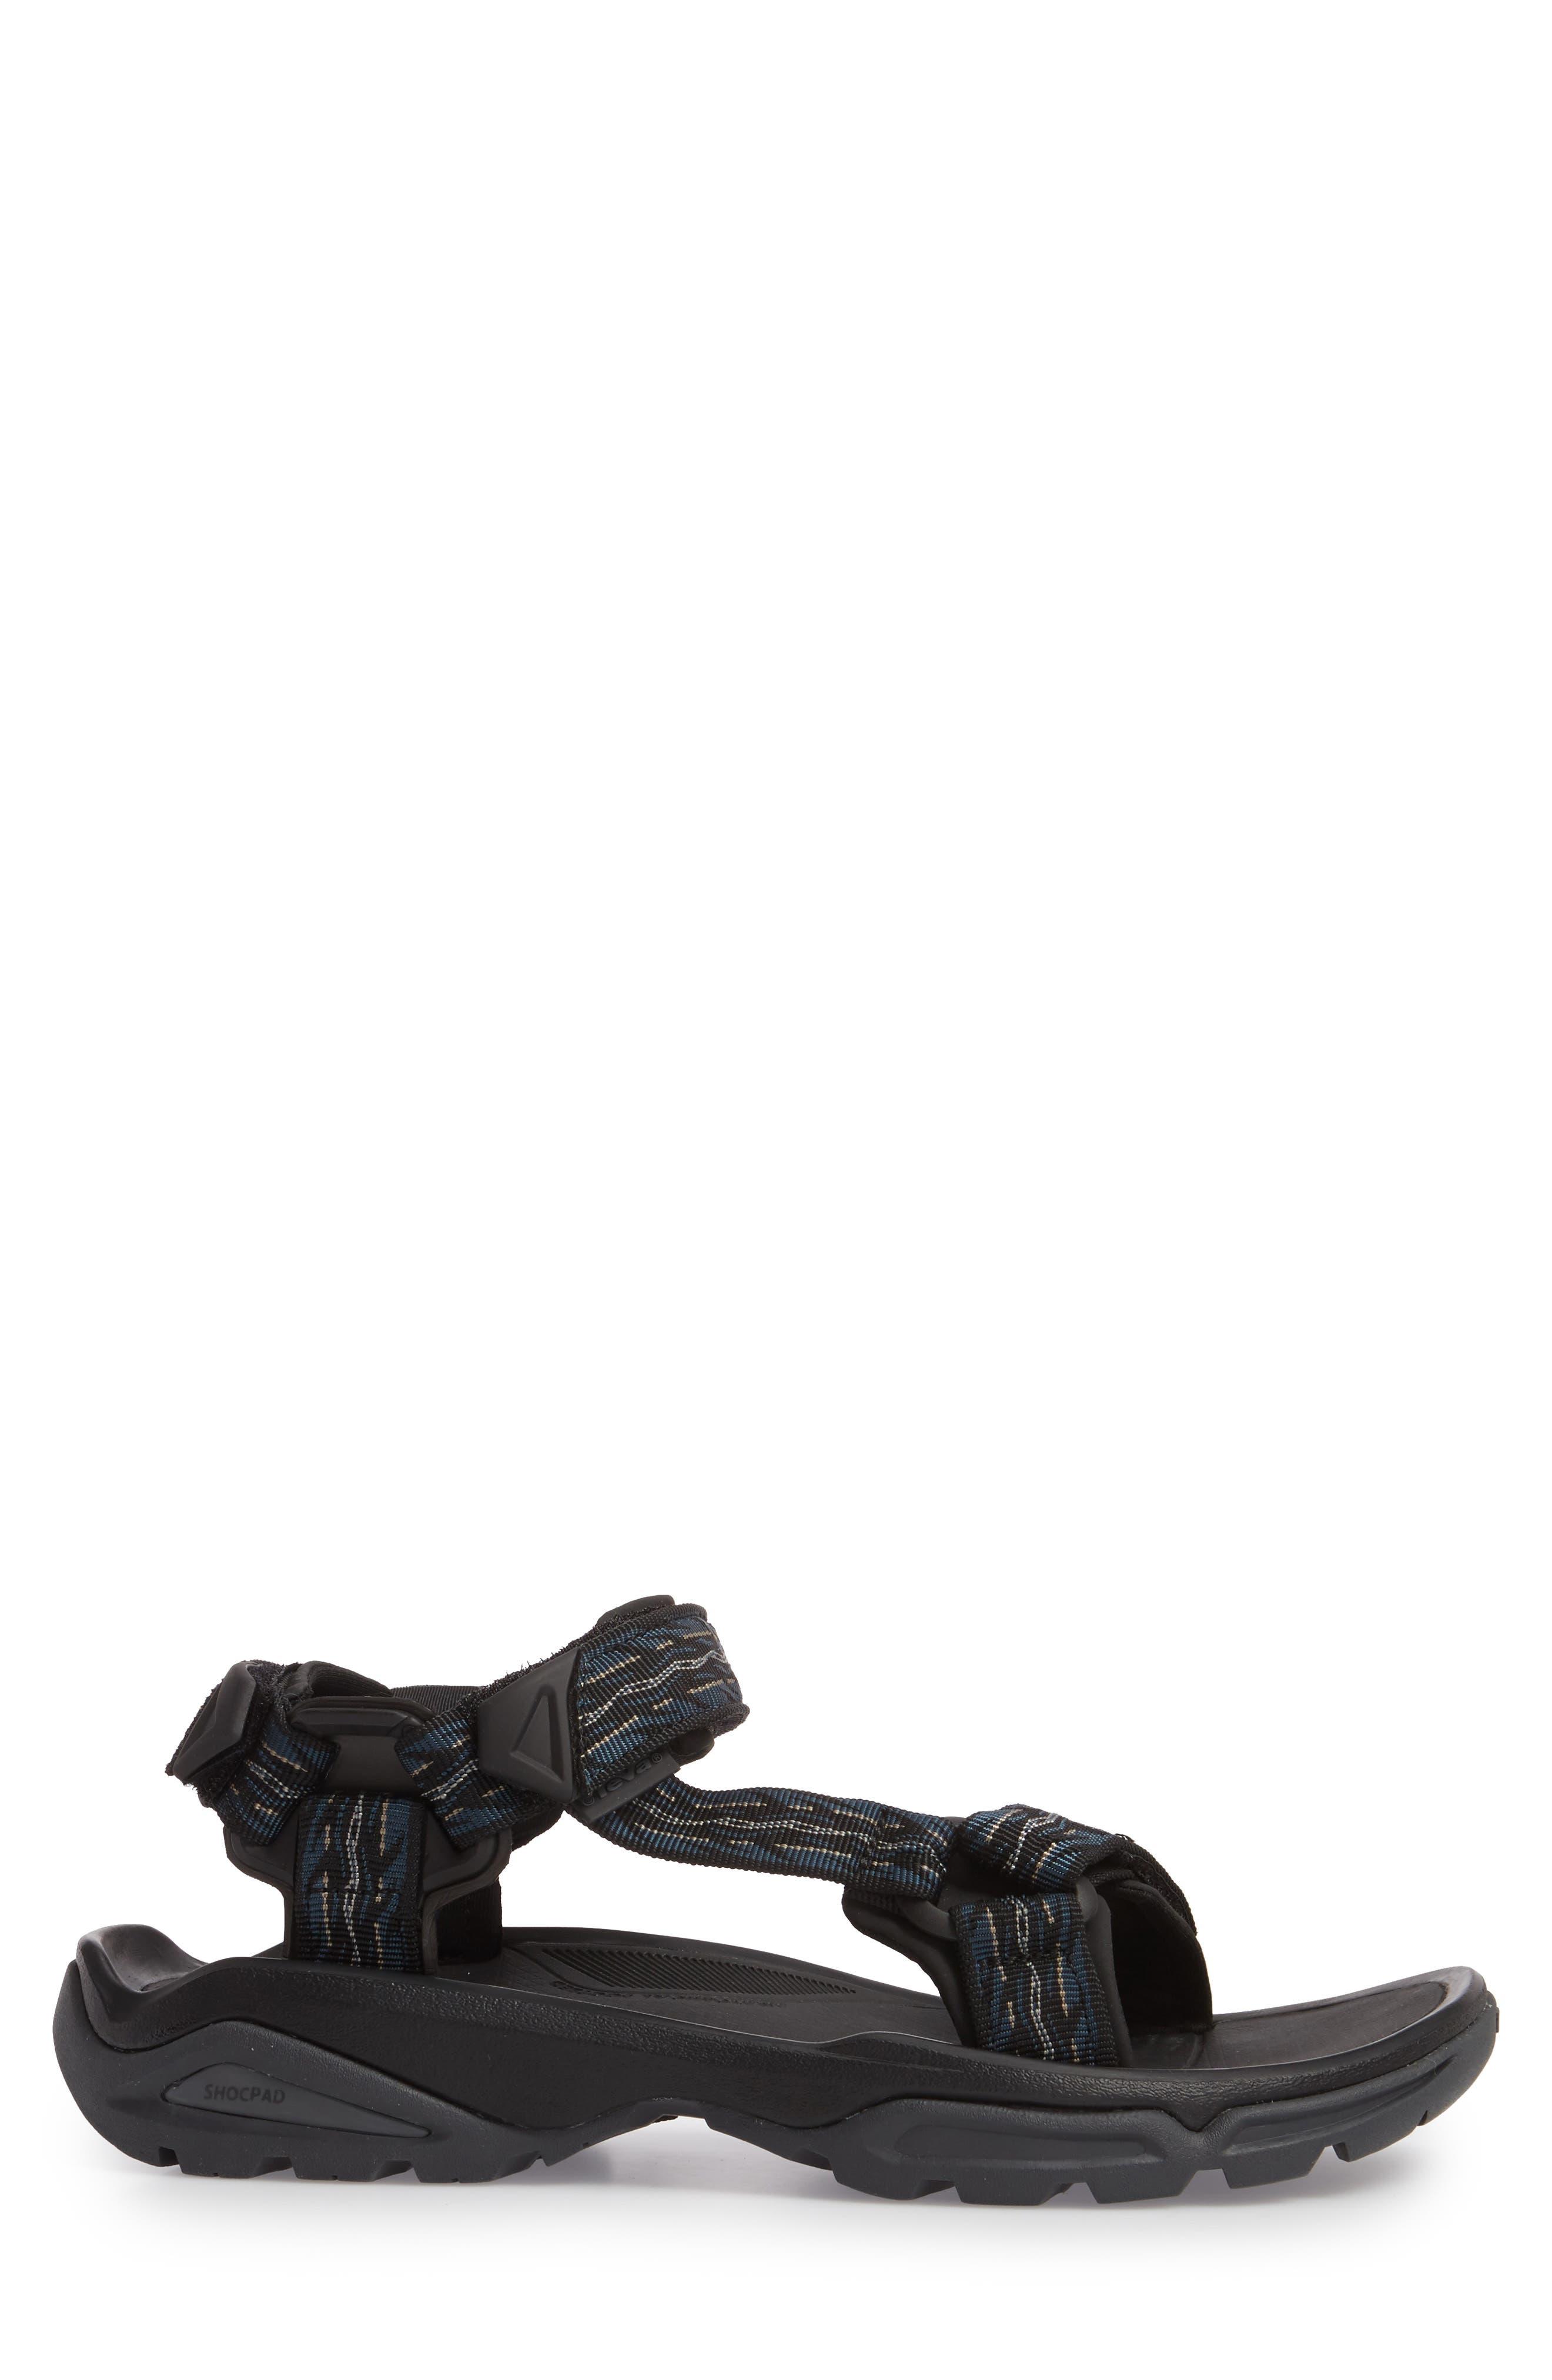 TEVA, Terra Fi 4 Sport Sandal, Alternate thumbnail 3, color, MIDNIGHT BLUE NYLON